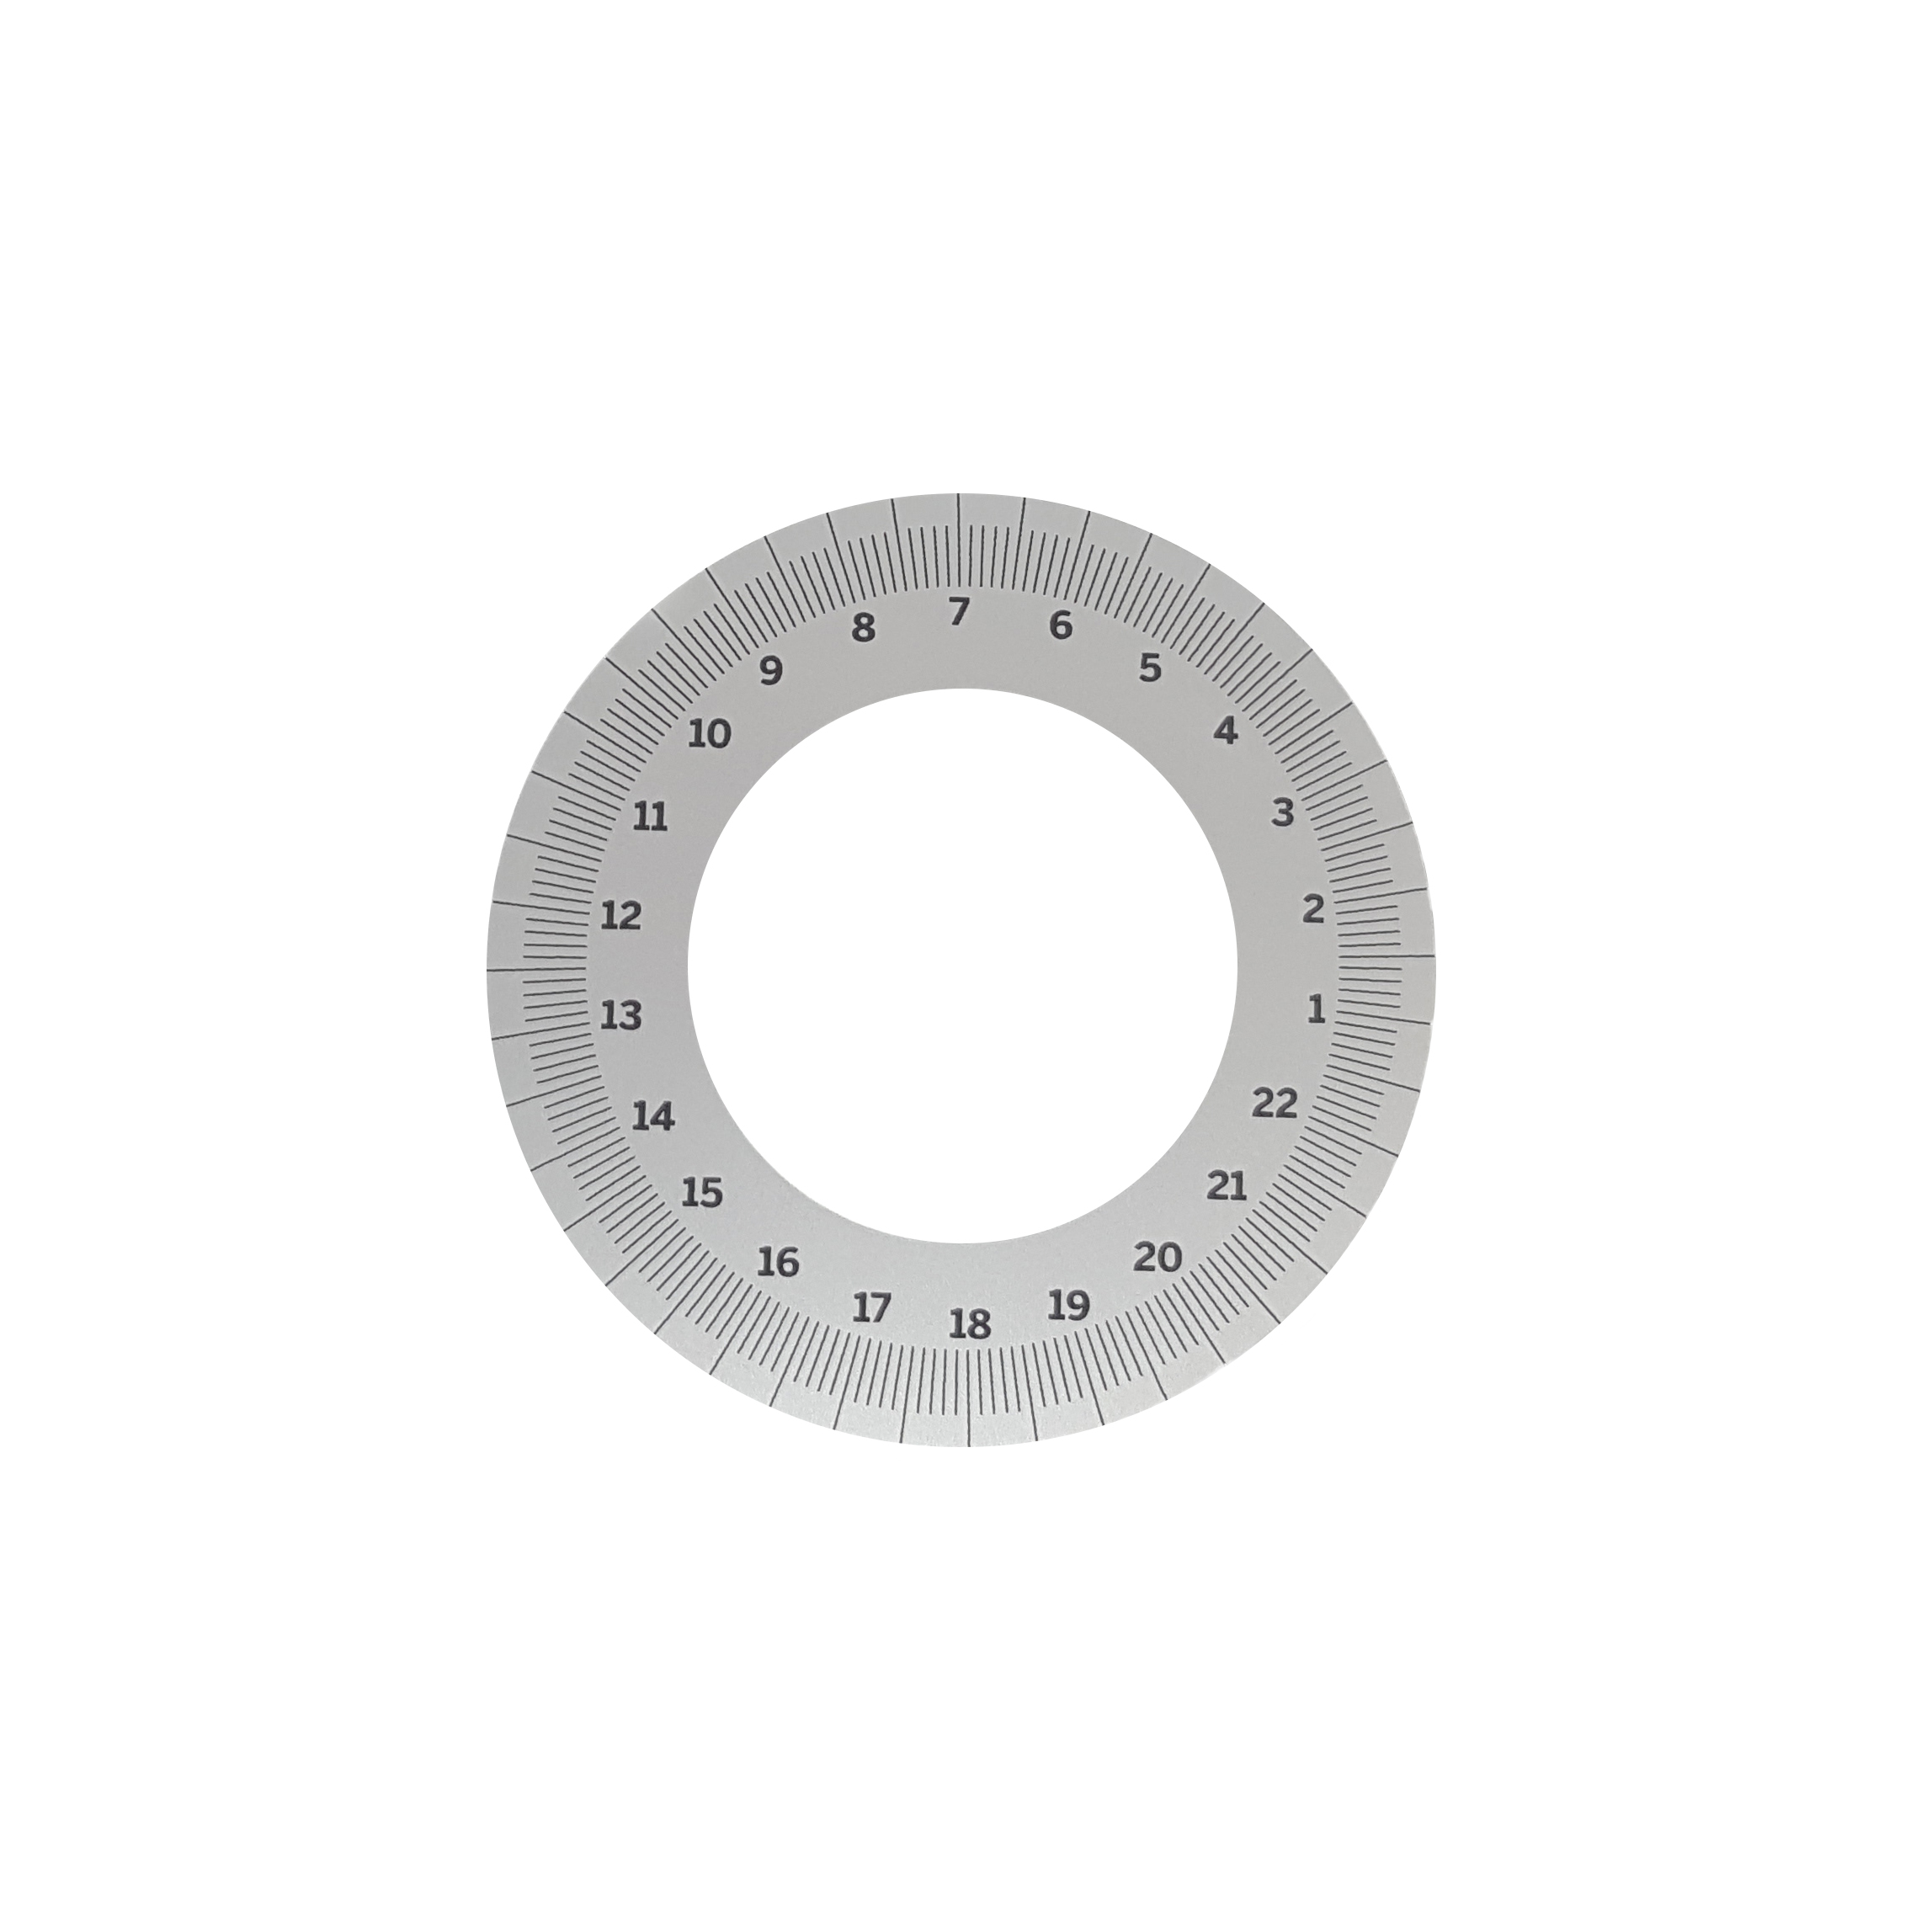 Mahlkonig EK43 Precision Dial SILVER